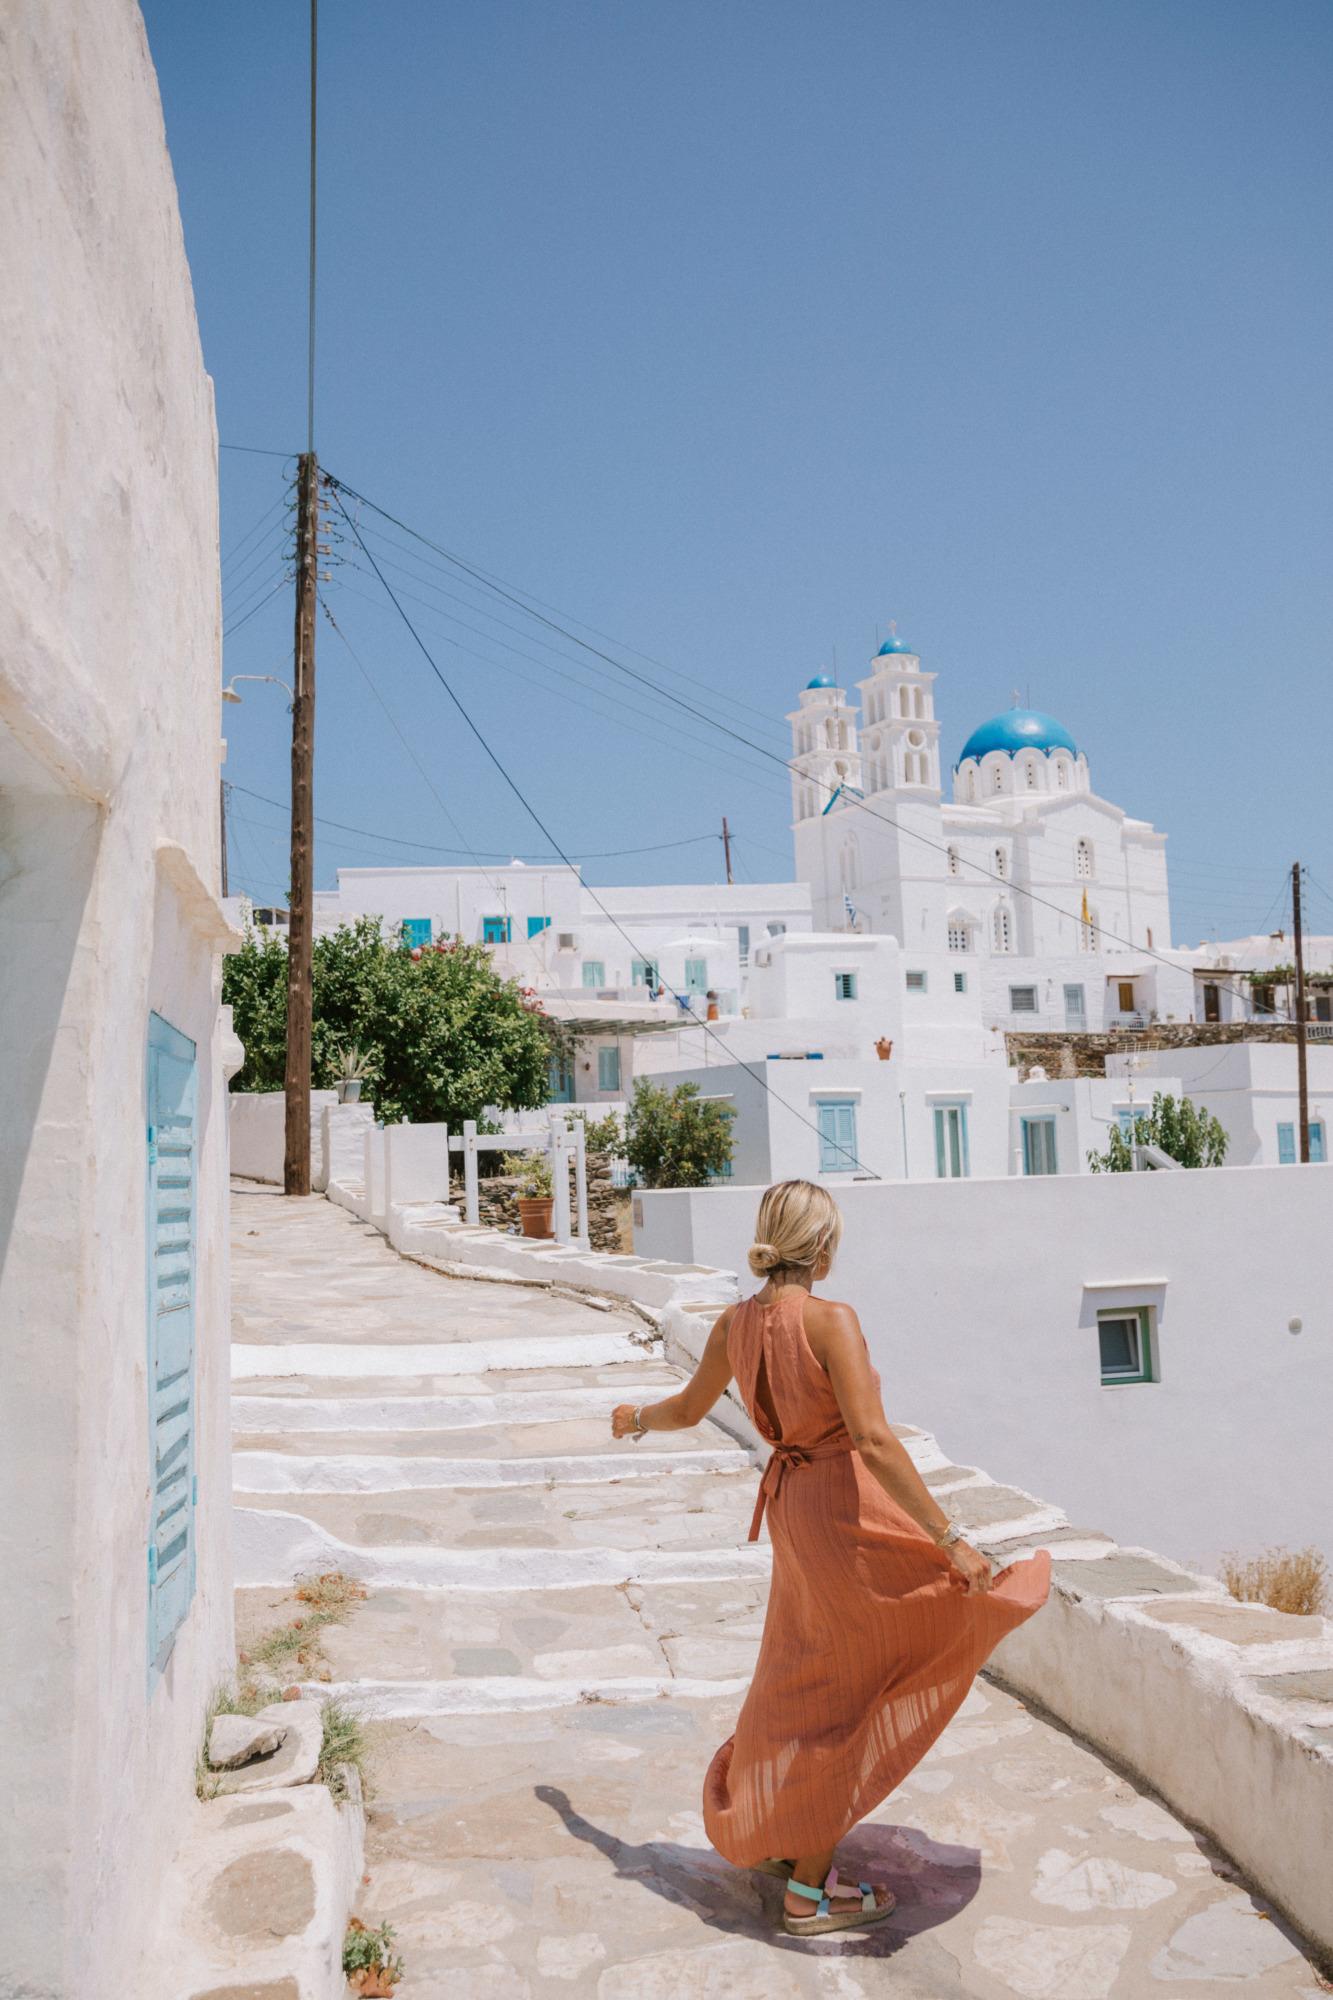 Visiter Apollonia Sifnos - Blondie Baby blog voyages